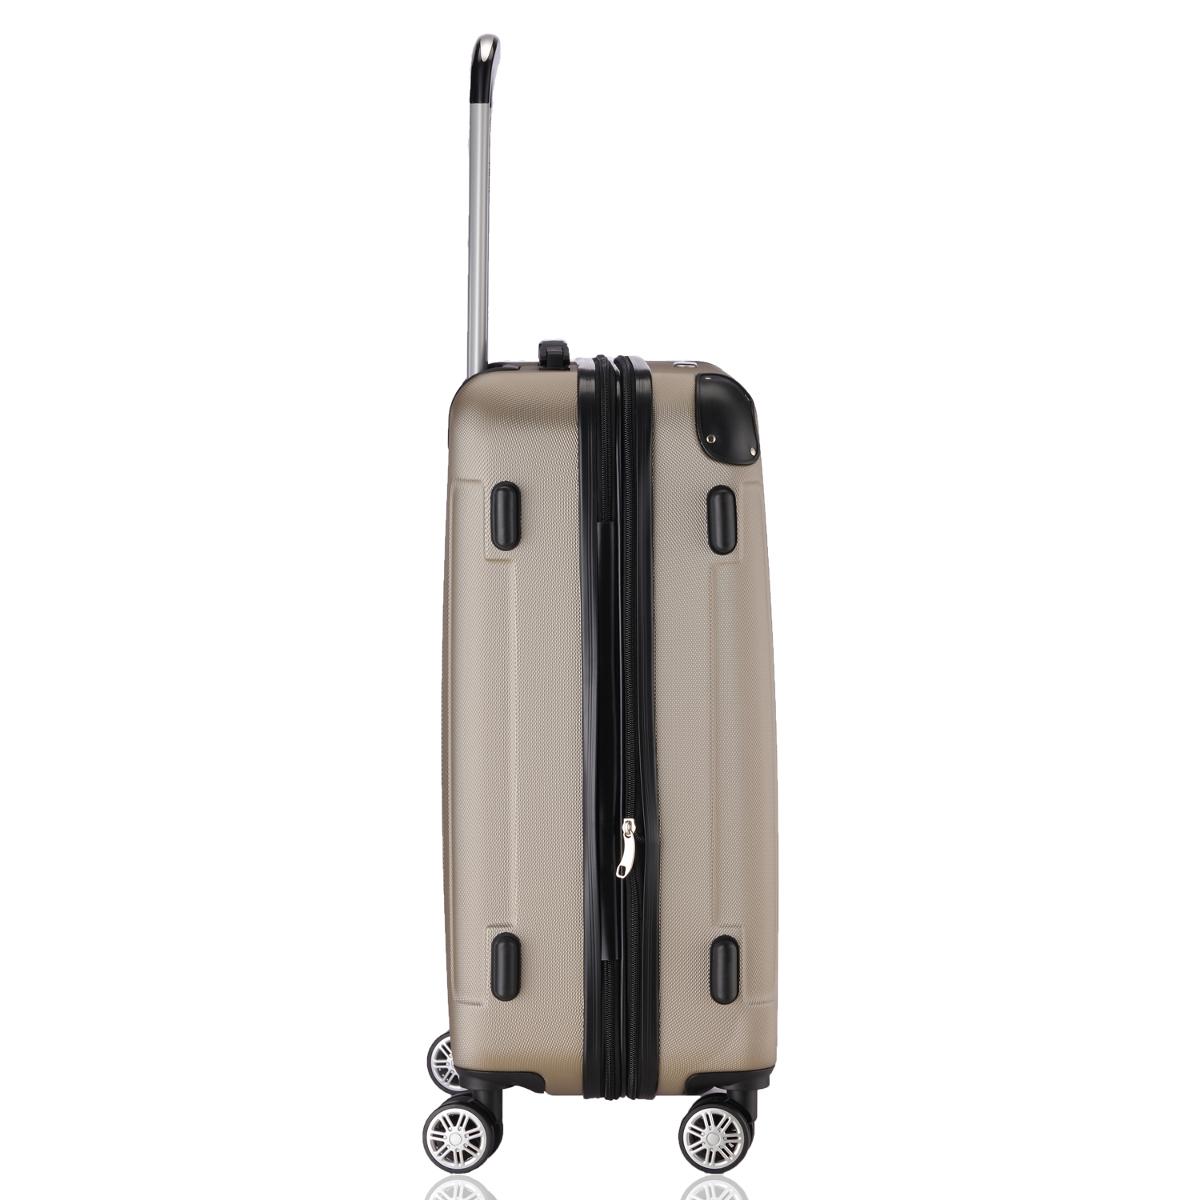 Koffer-Flexot-2045-Hartschalenkoffer-Trolley-Kofferset-Reisekoffer-M-L-XL-Set Indexbild 49